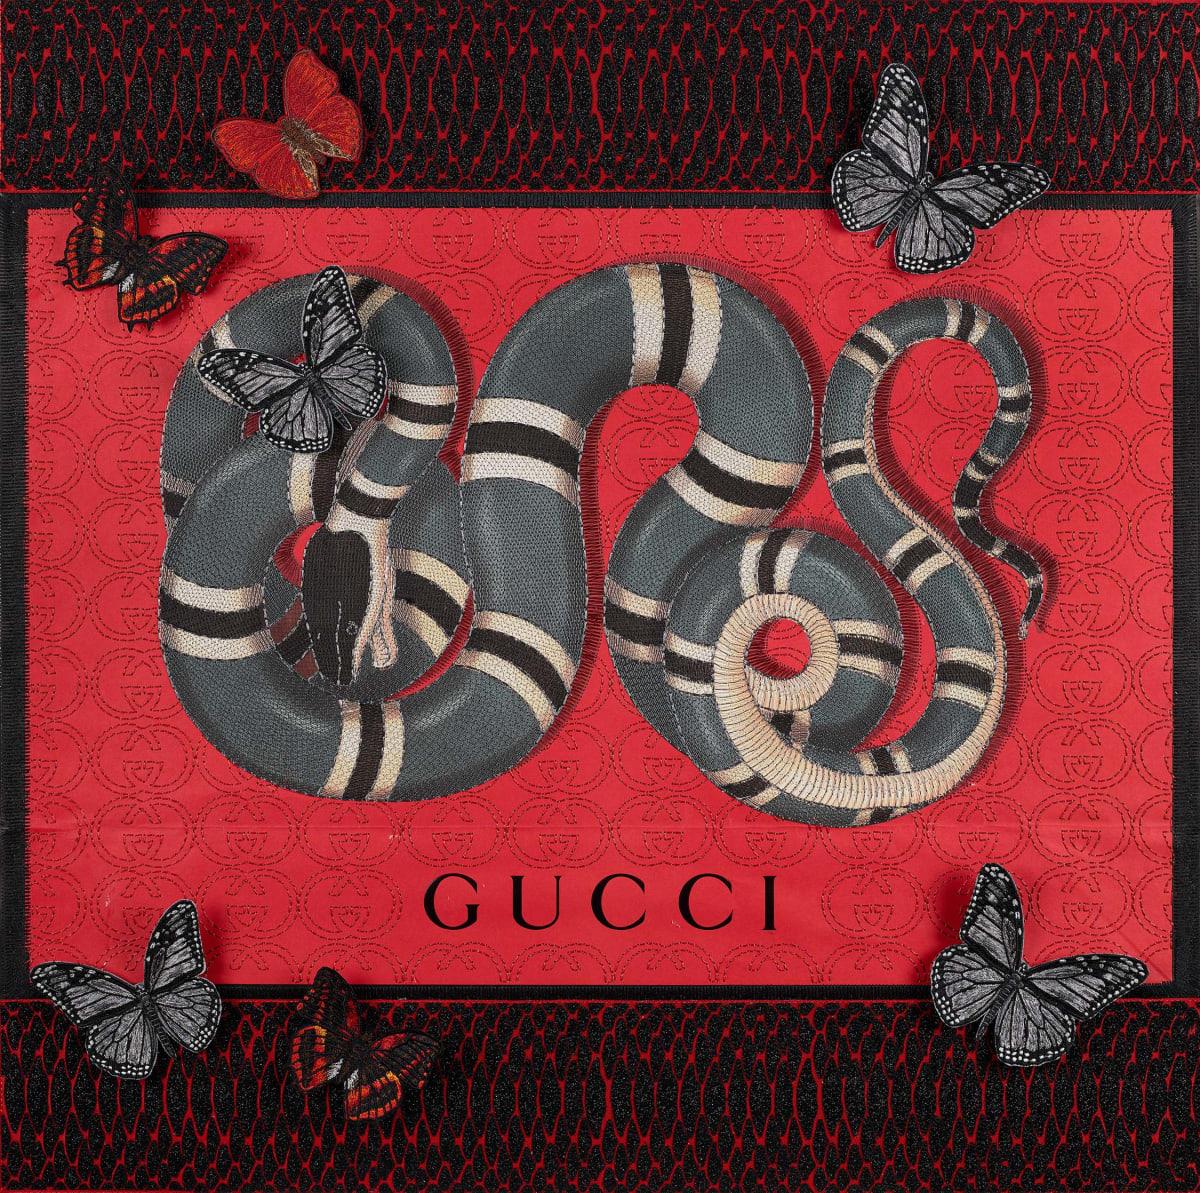 Stephen Wilson, Gucci Snake Tracks, 2020